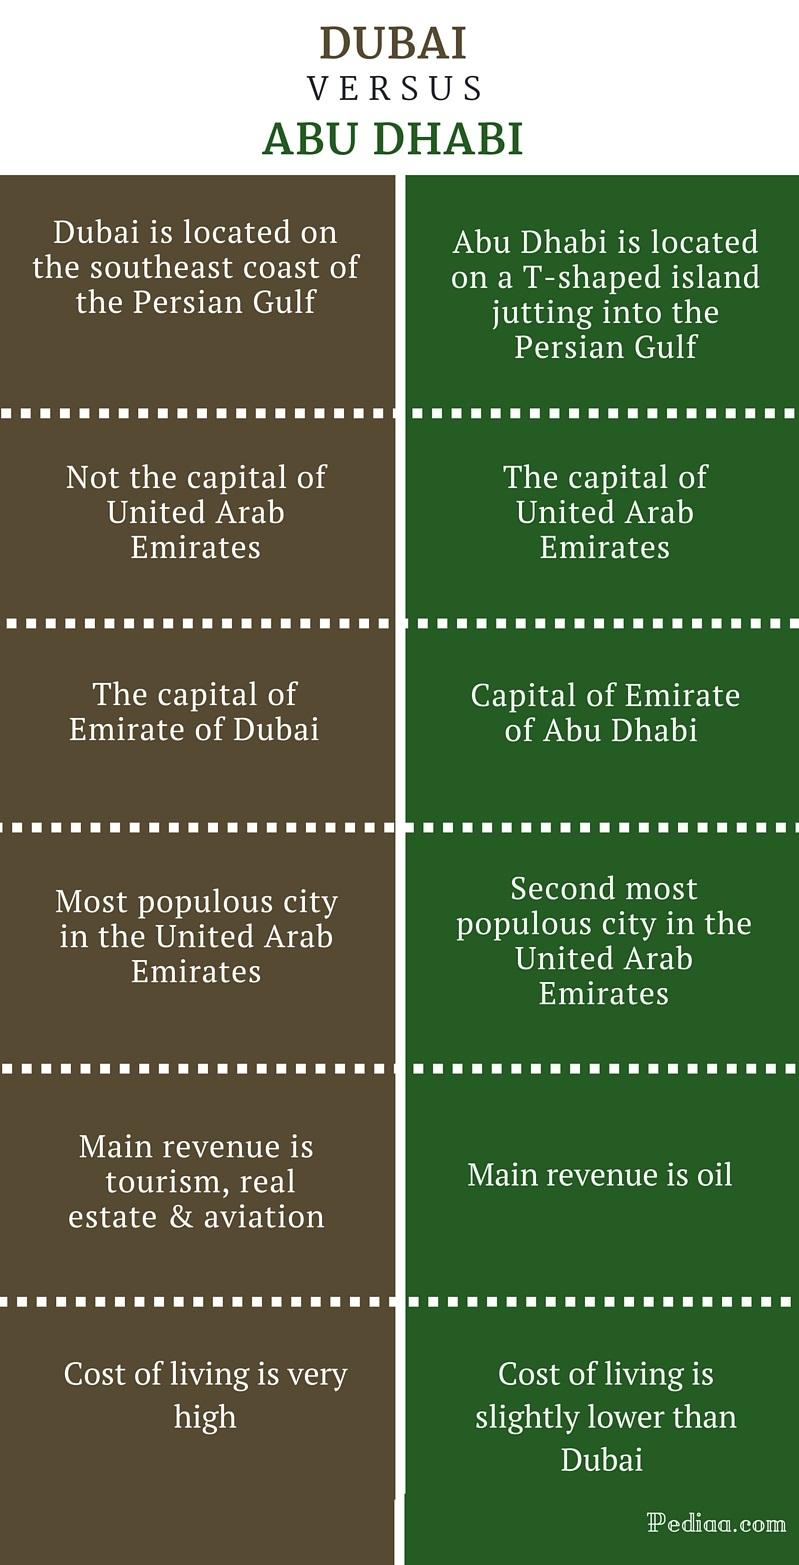 Difference Between Dubai and Abu Dhabi | Location, Capital